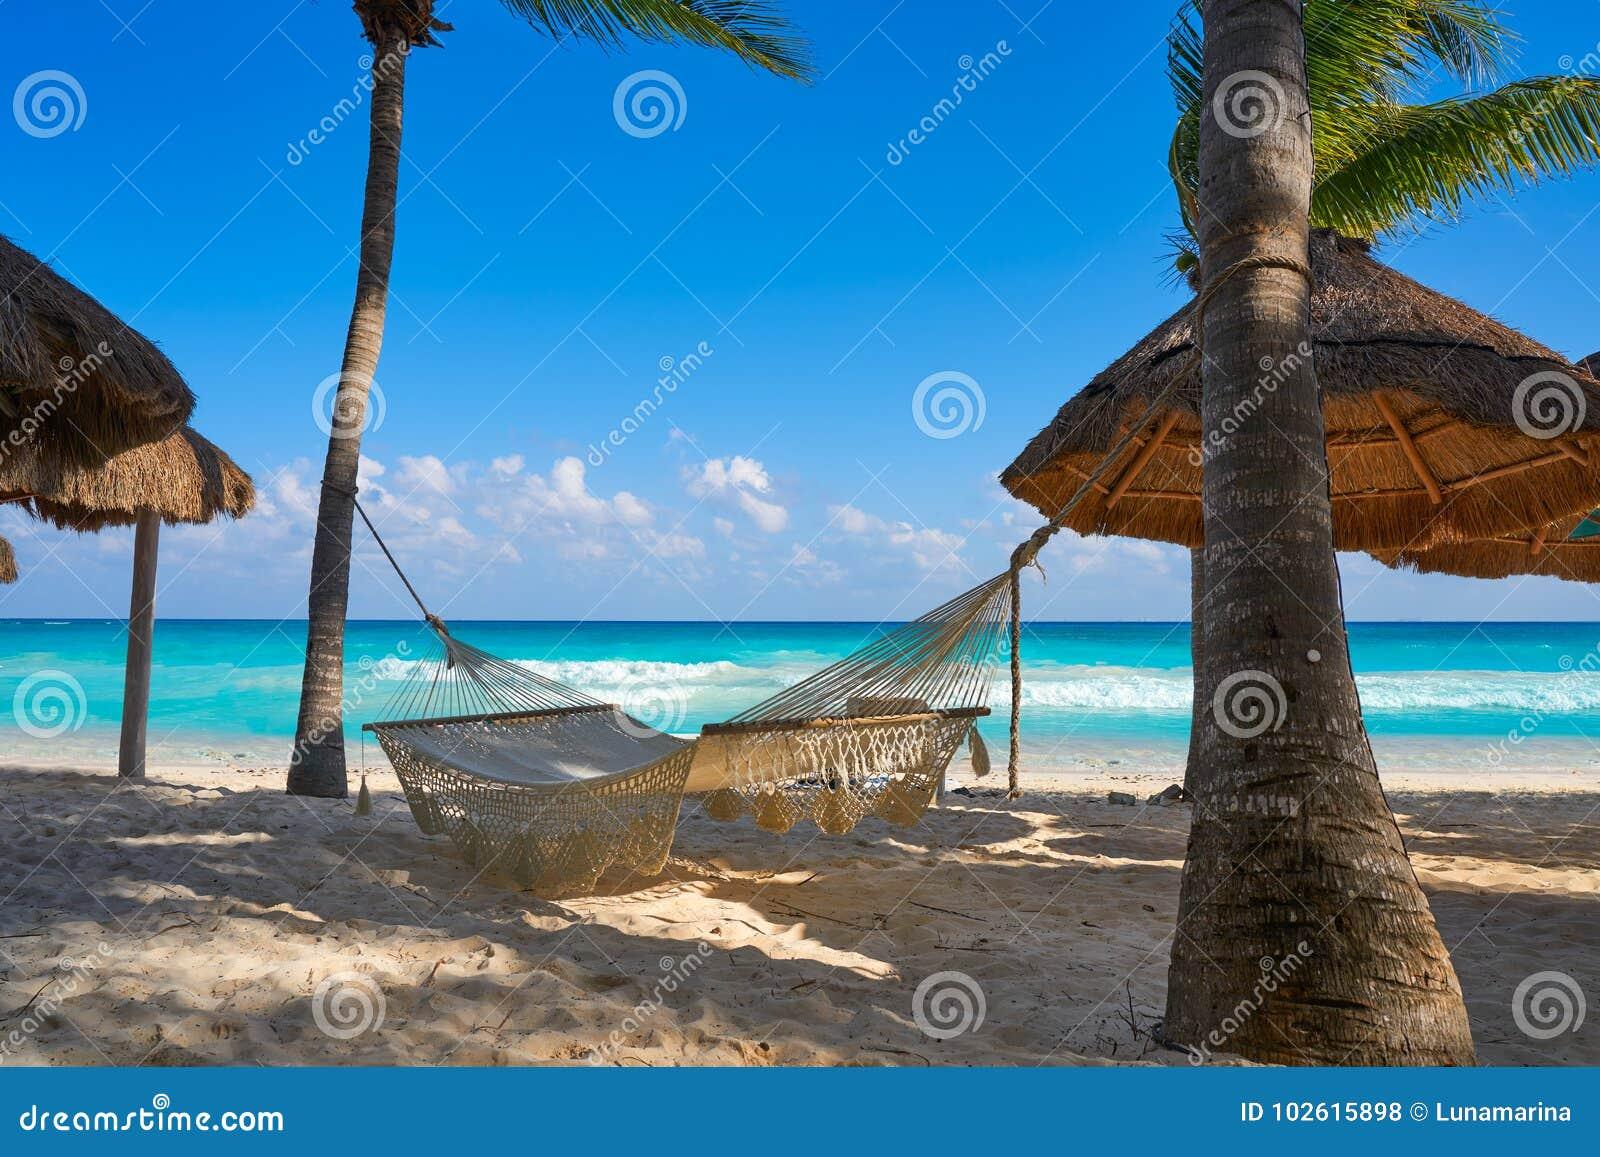 Playa del Carmenstrand in Riviera Maya